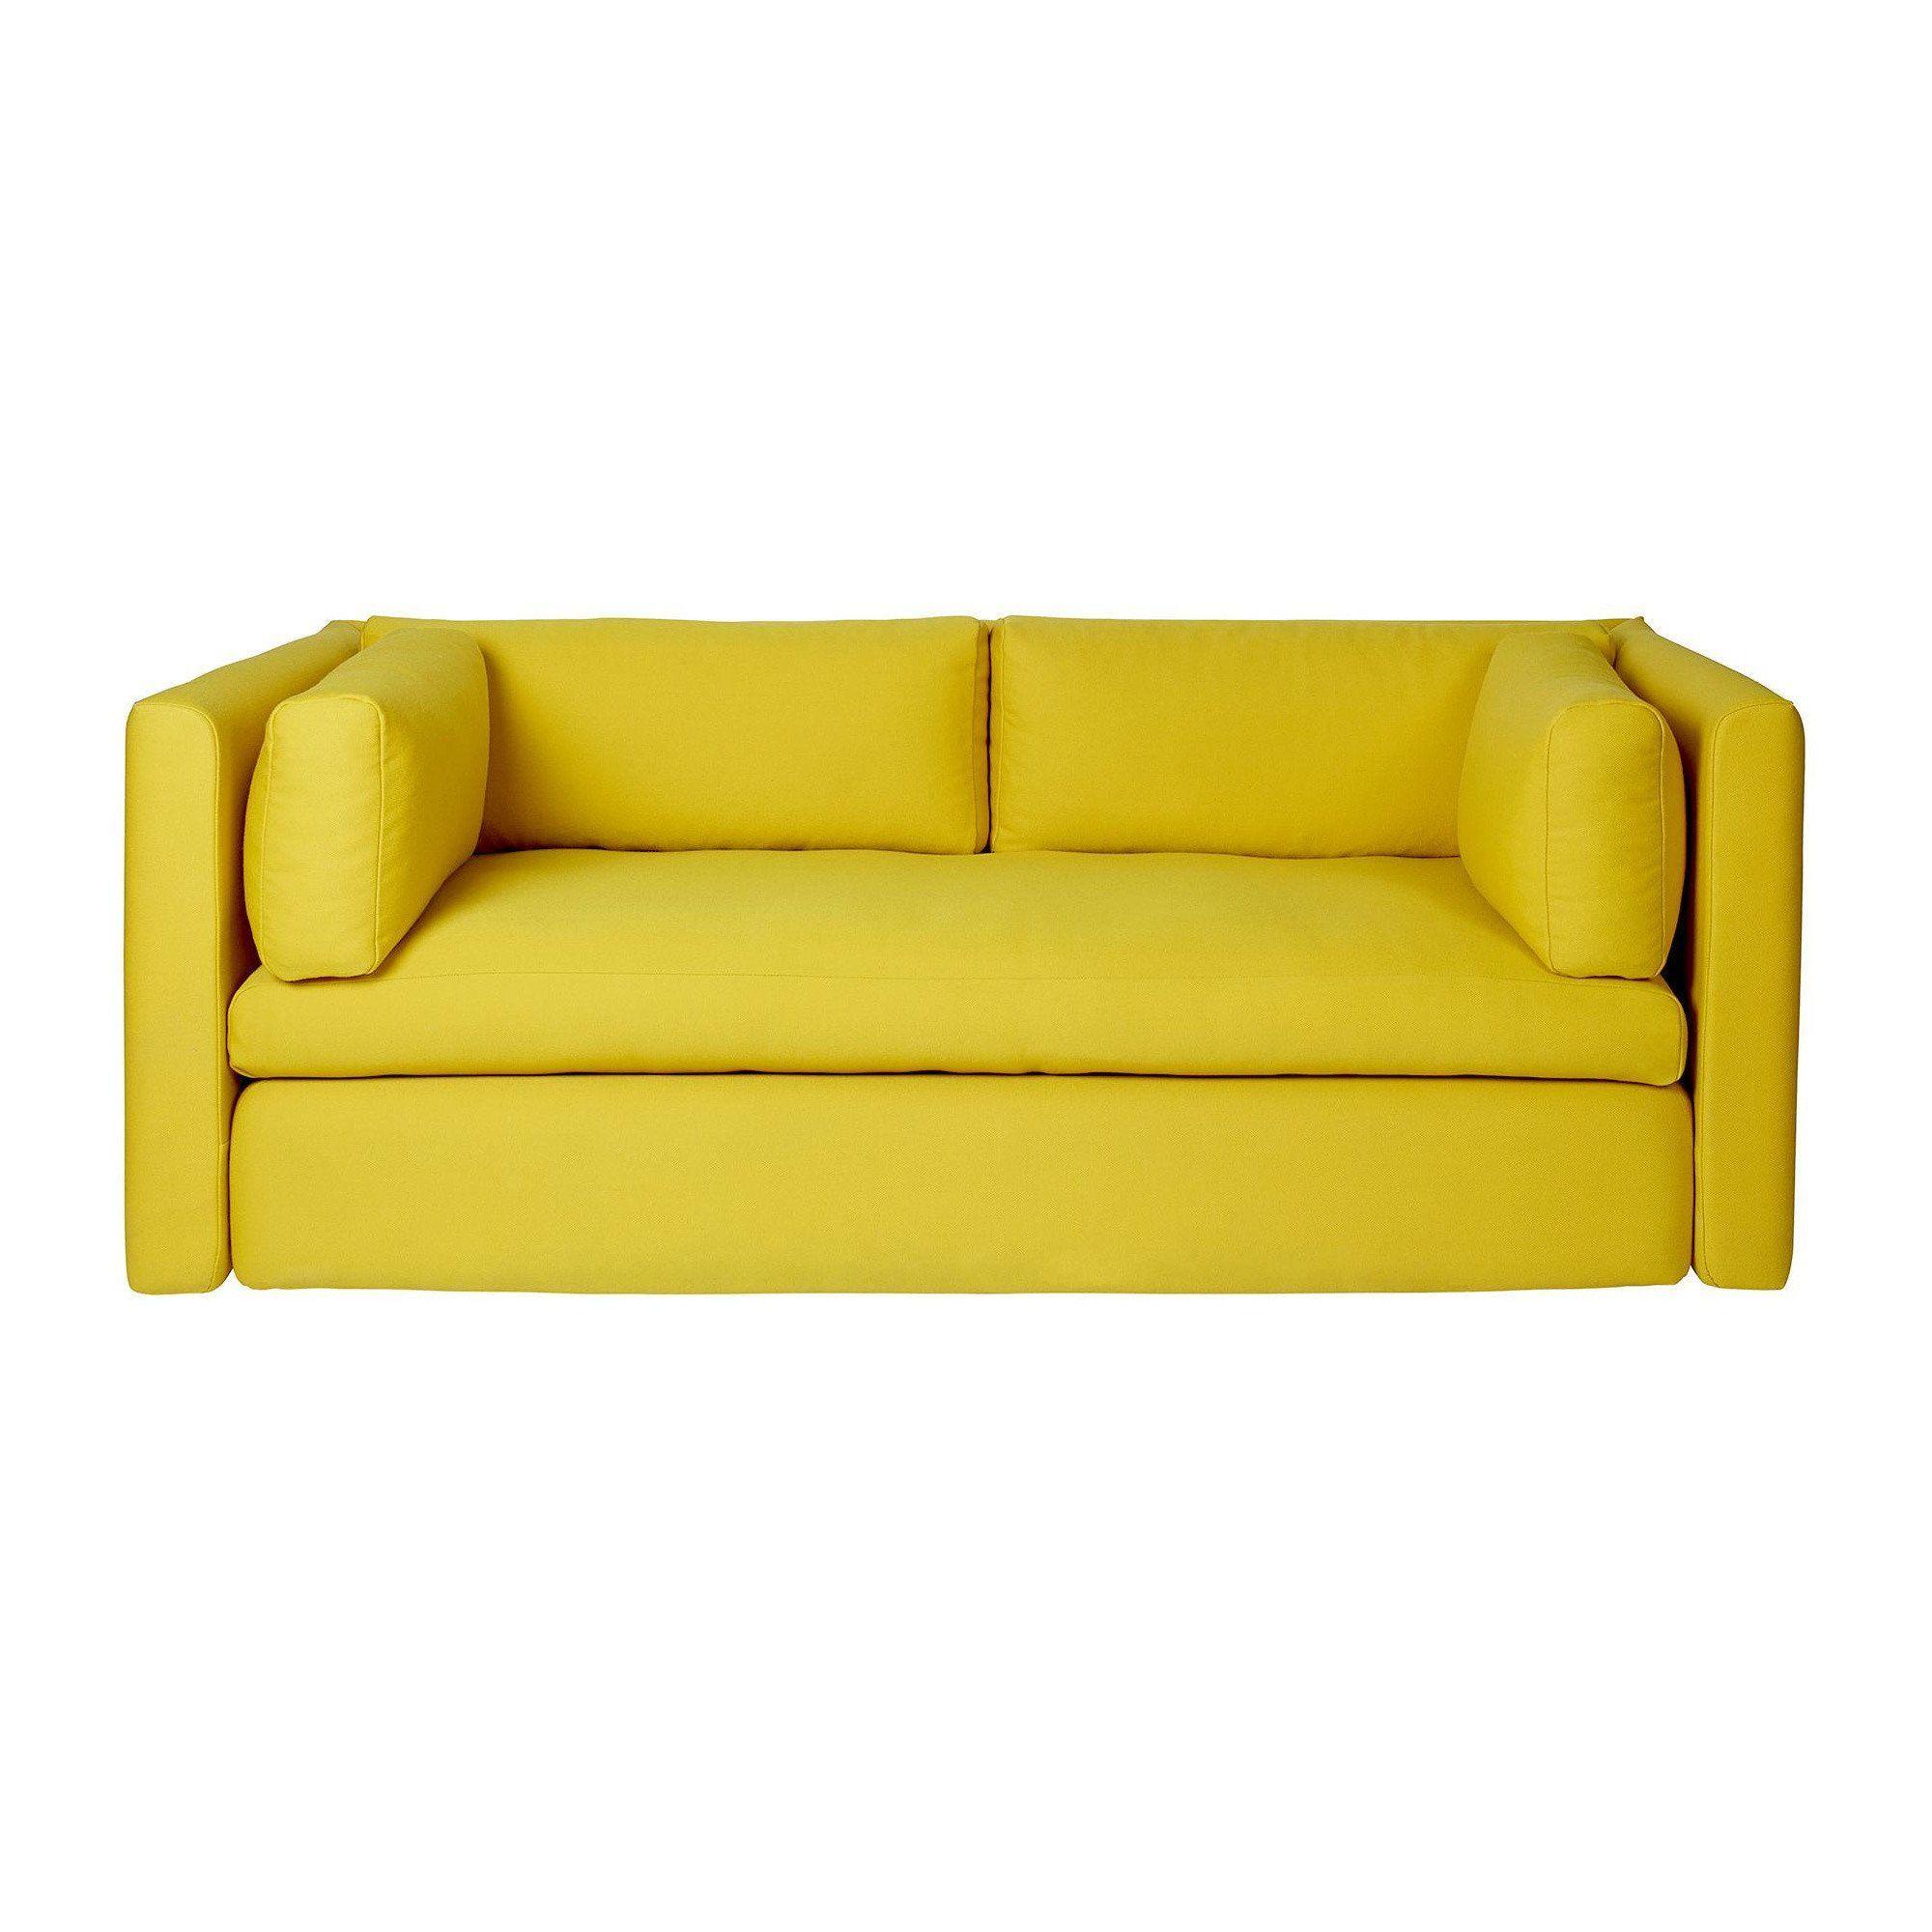 hackney 2 sitzer sofa hay. Black Bedroom Furniture Sets. Home Design Ideas